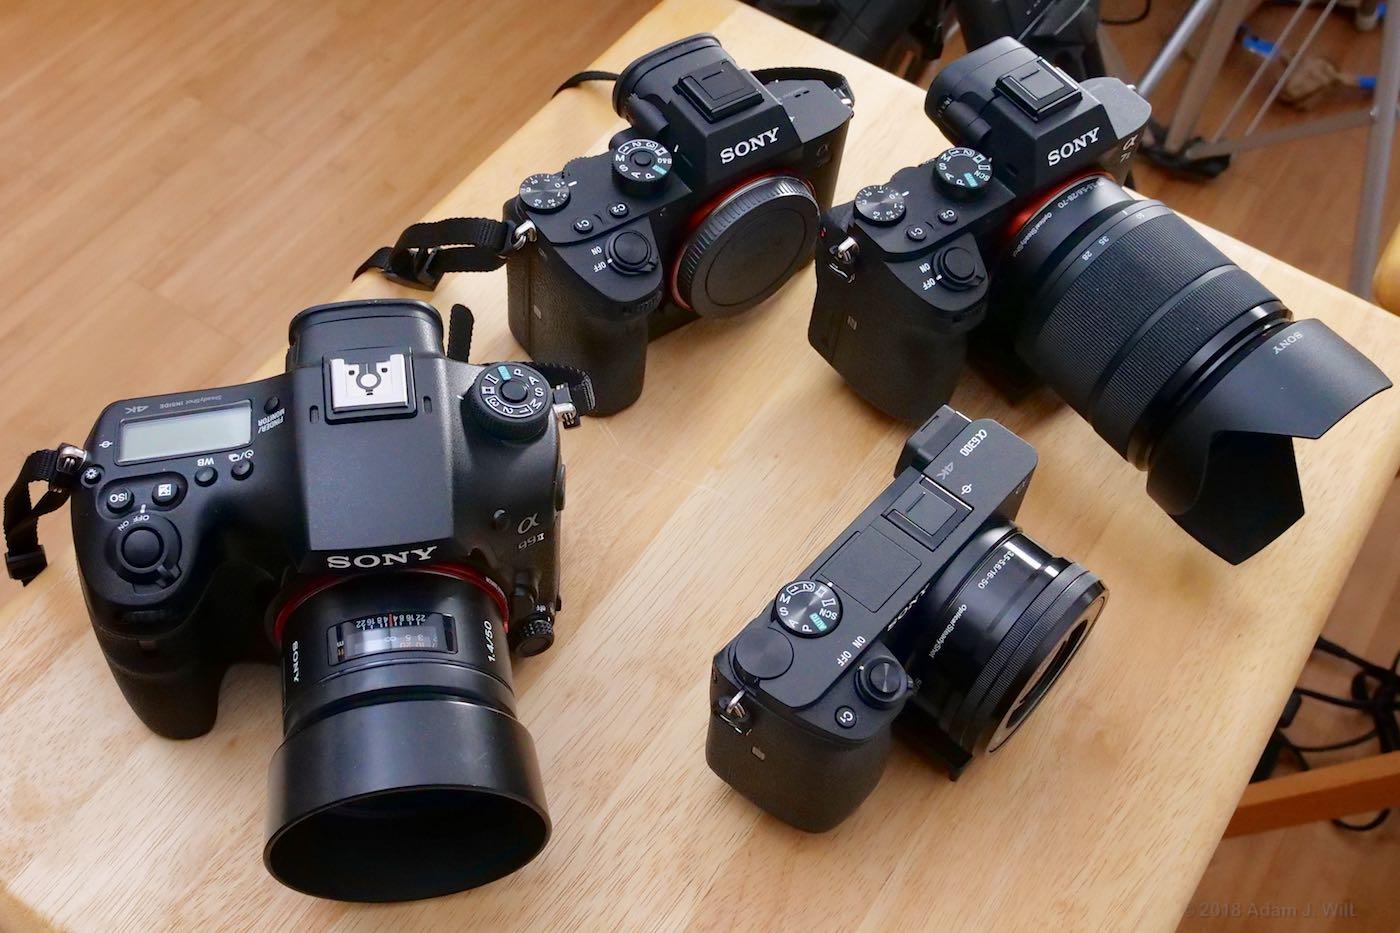 Four Sony mirrorless cameras